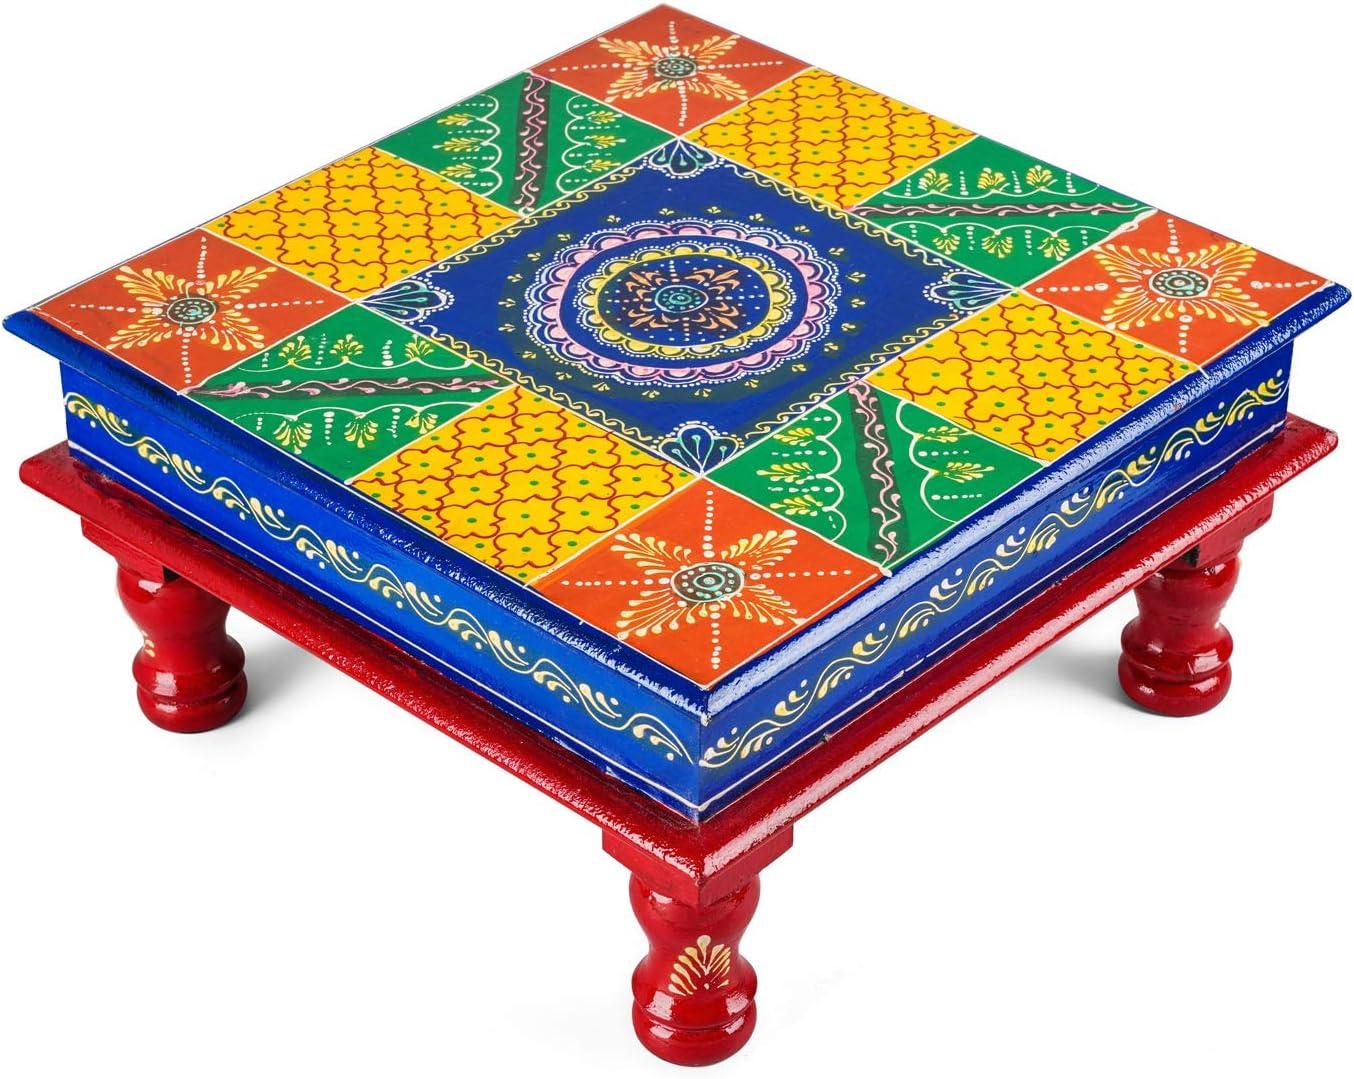 2dozay Wooden Floral Printed Multipurpose Pooja Mandir Chowki (Multicolour)